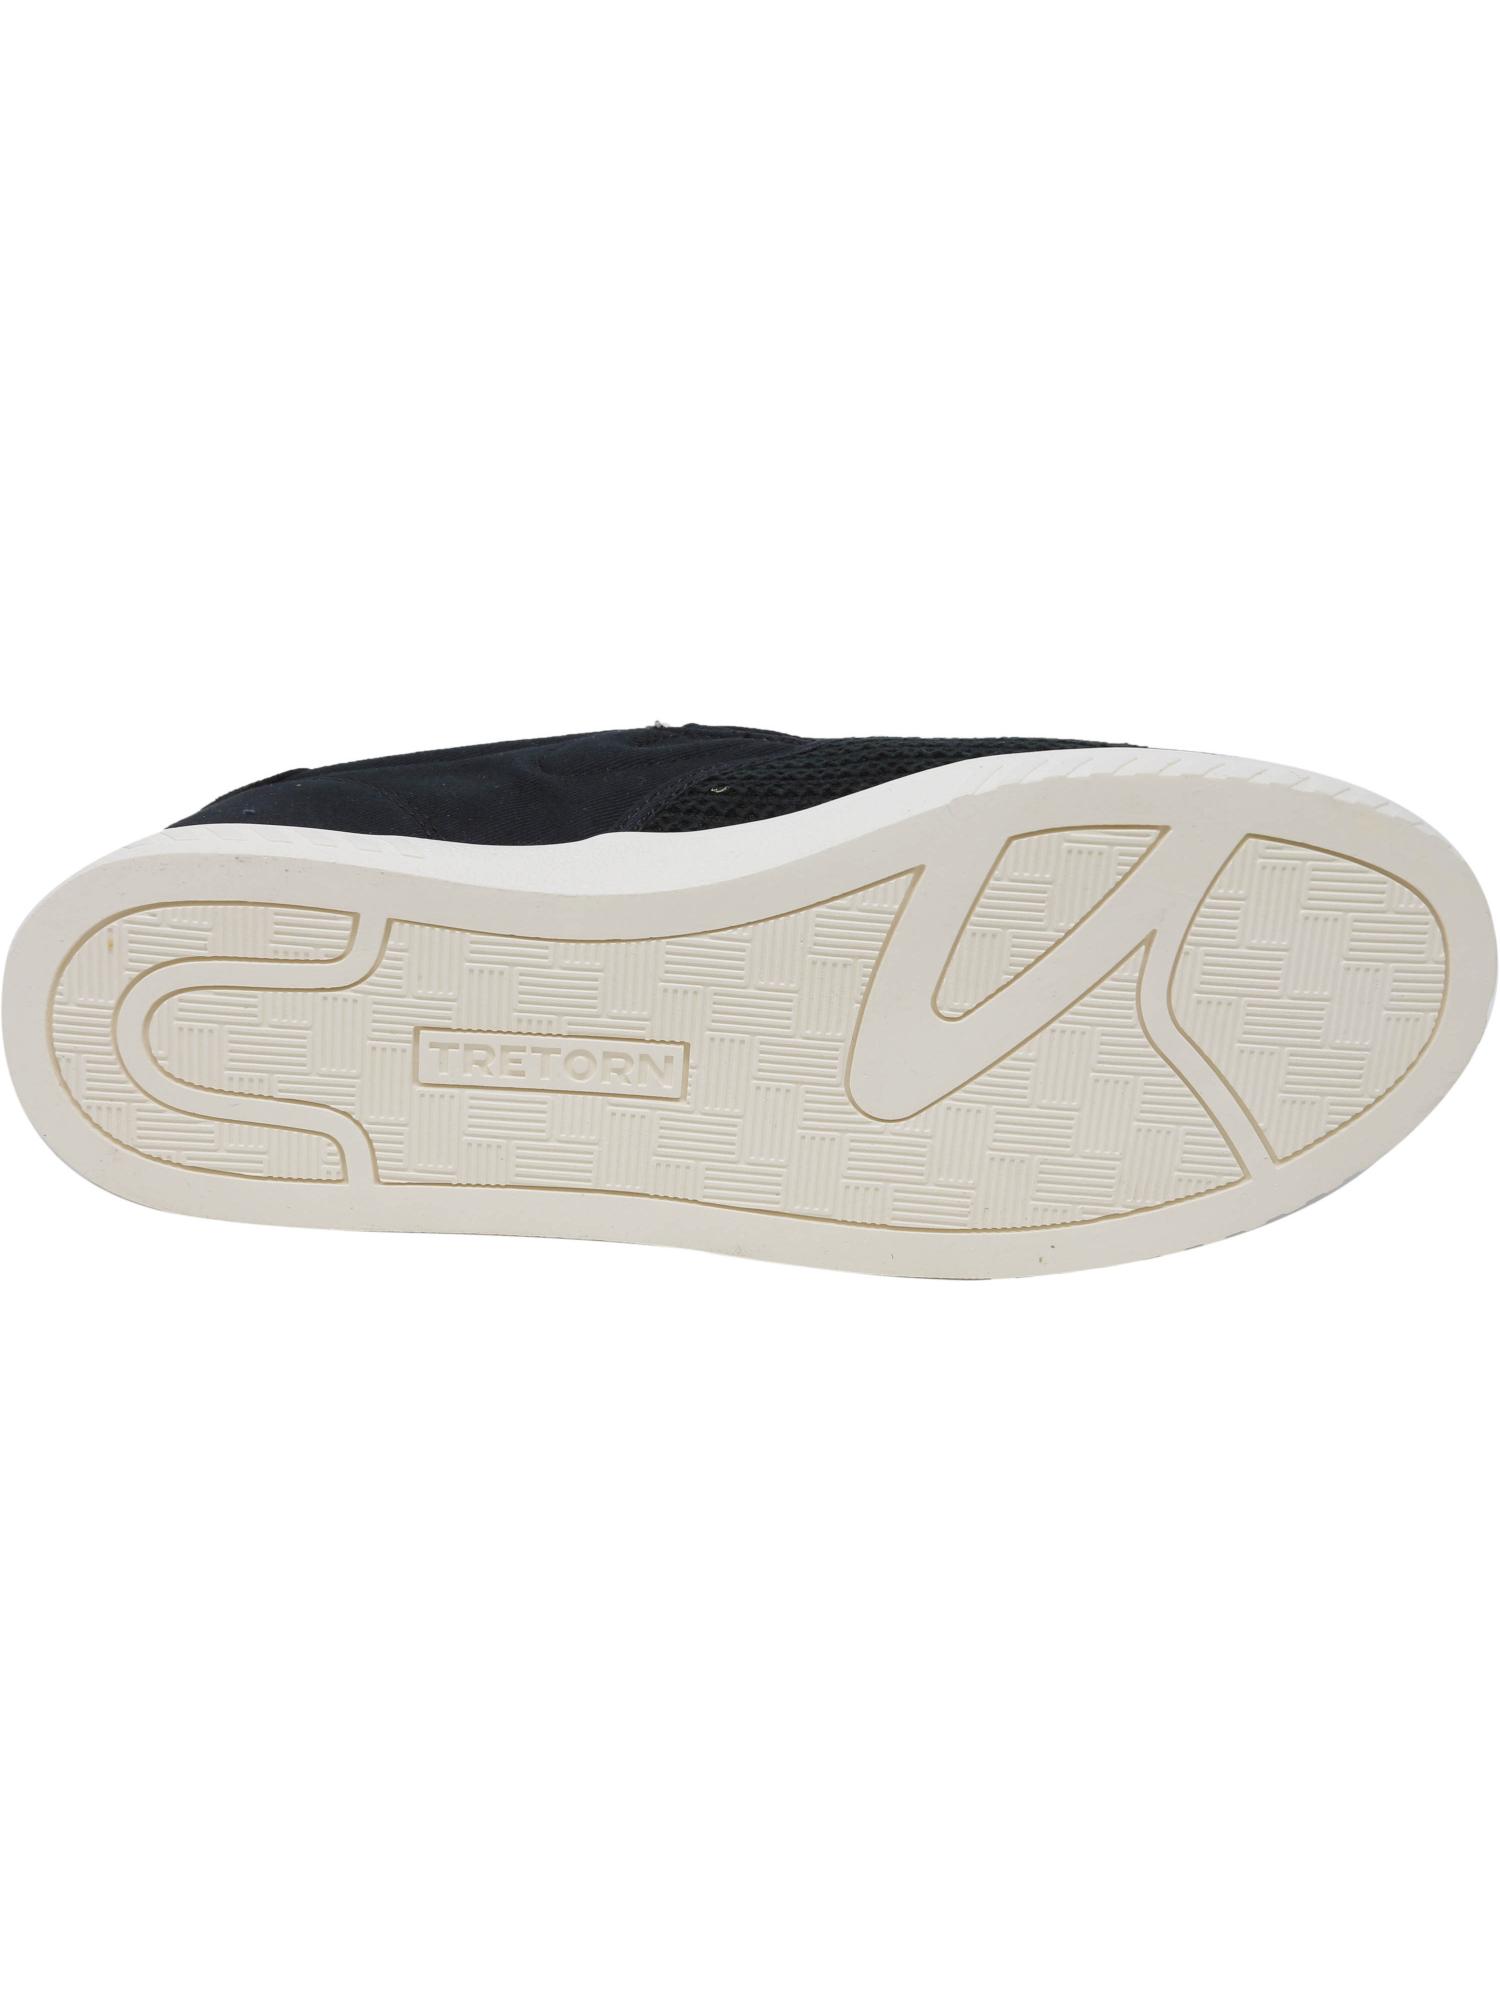 Tretorn-Femmes-Cruz-tissu-aux-chevilles-Haute-Slip-Chaussures-en miniature 7